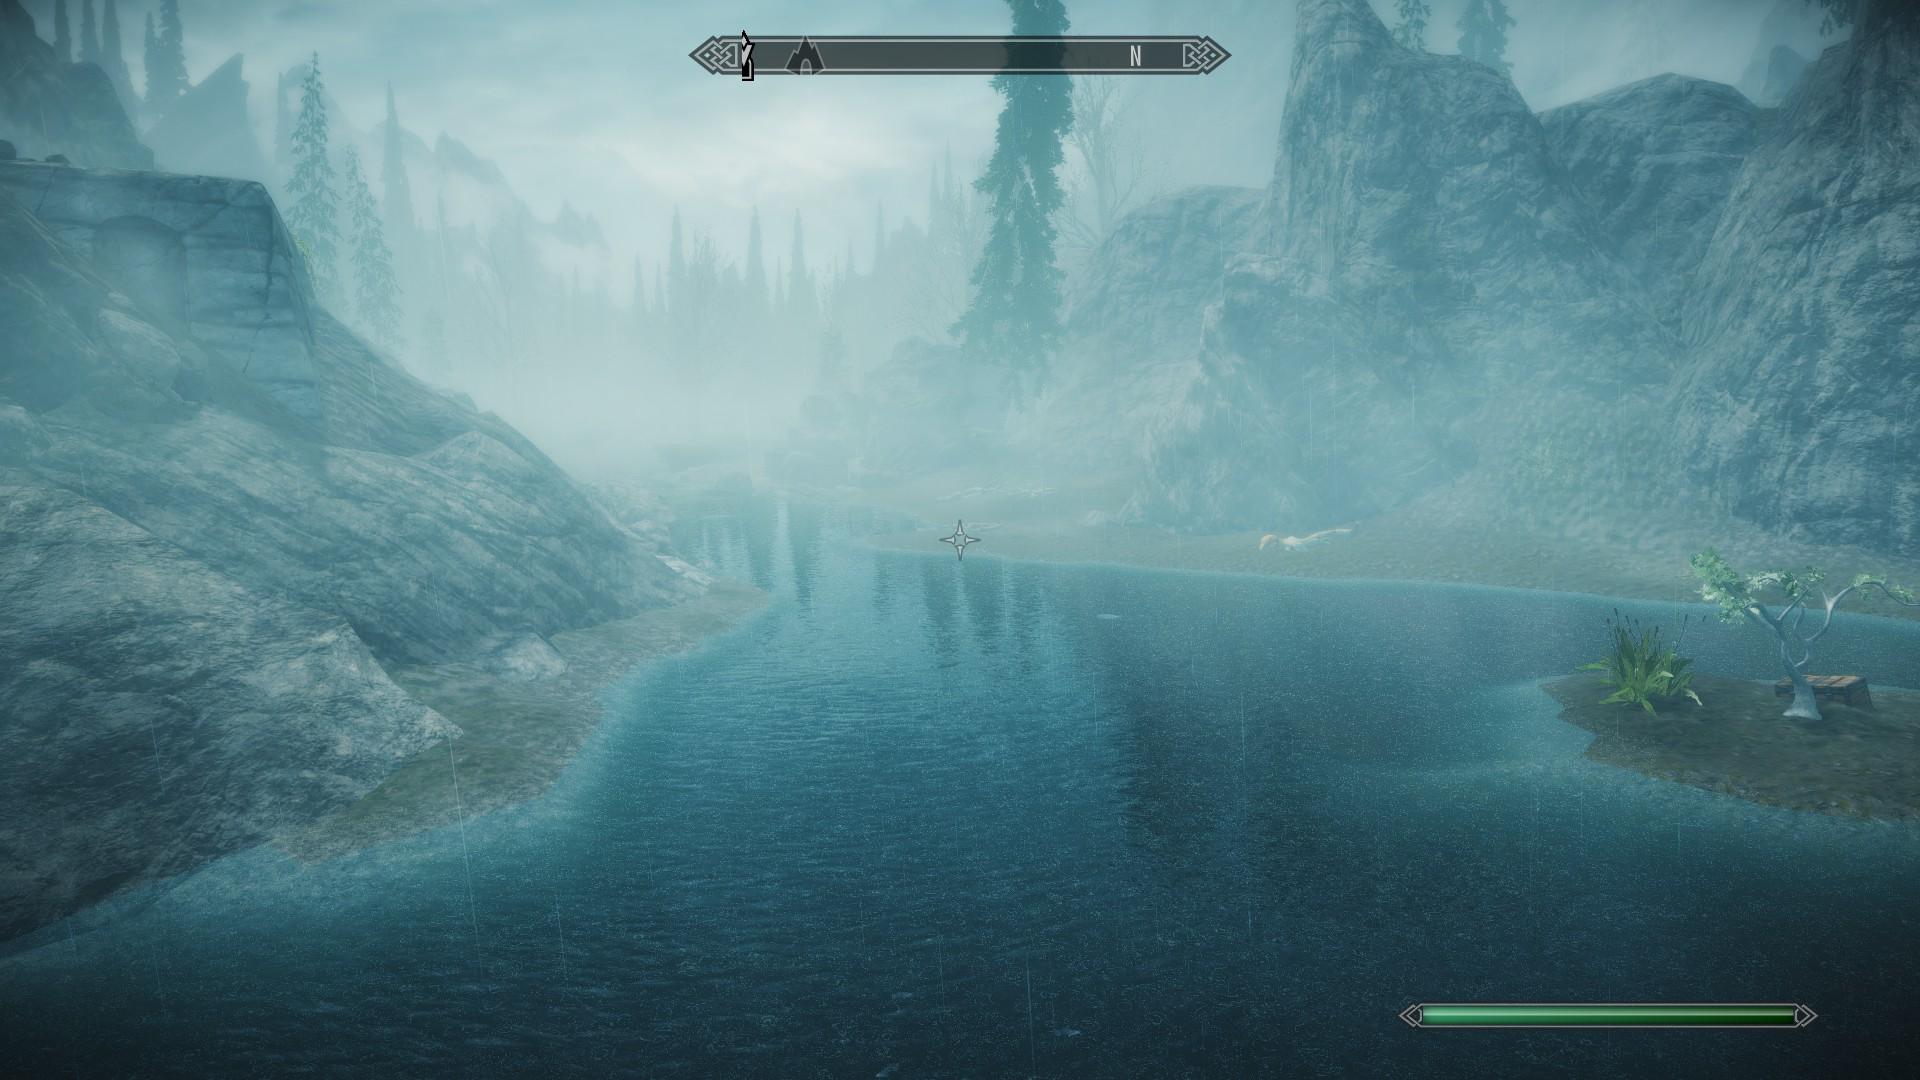 20180210133034_1.jpg - Elder Scrolls 5: Skyrim, the